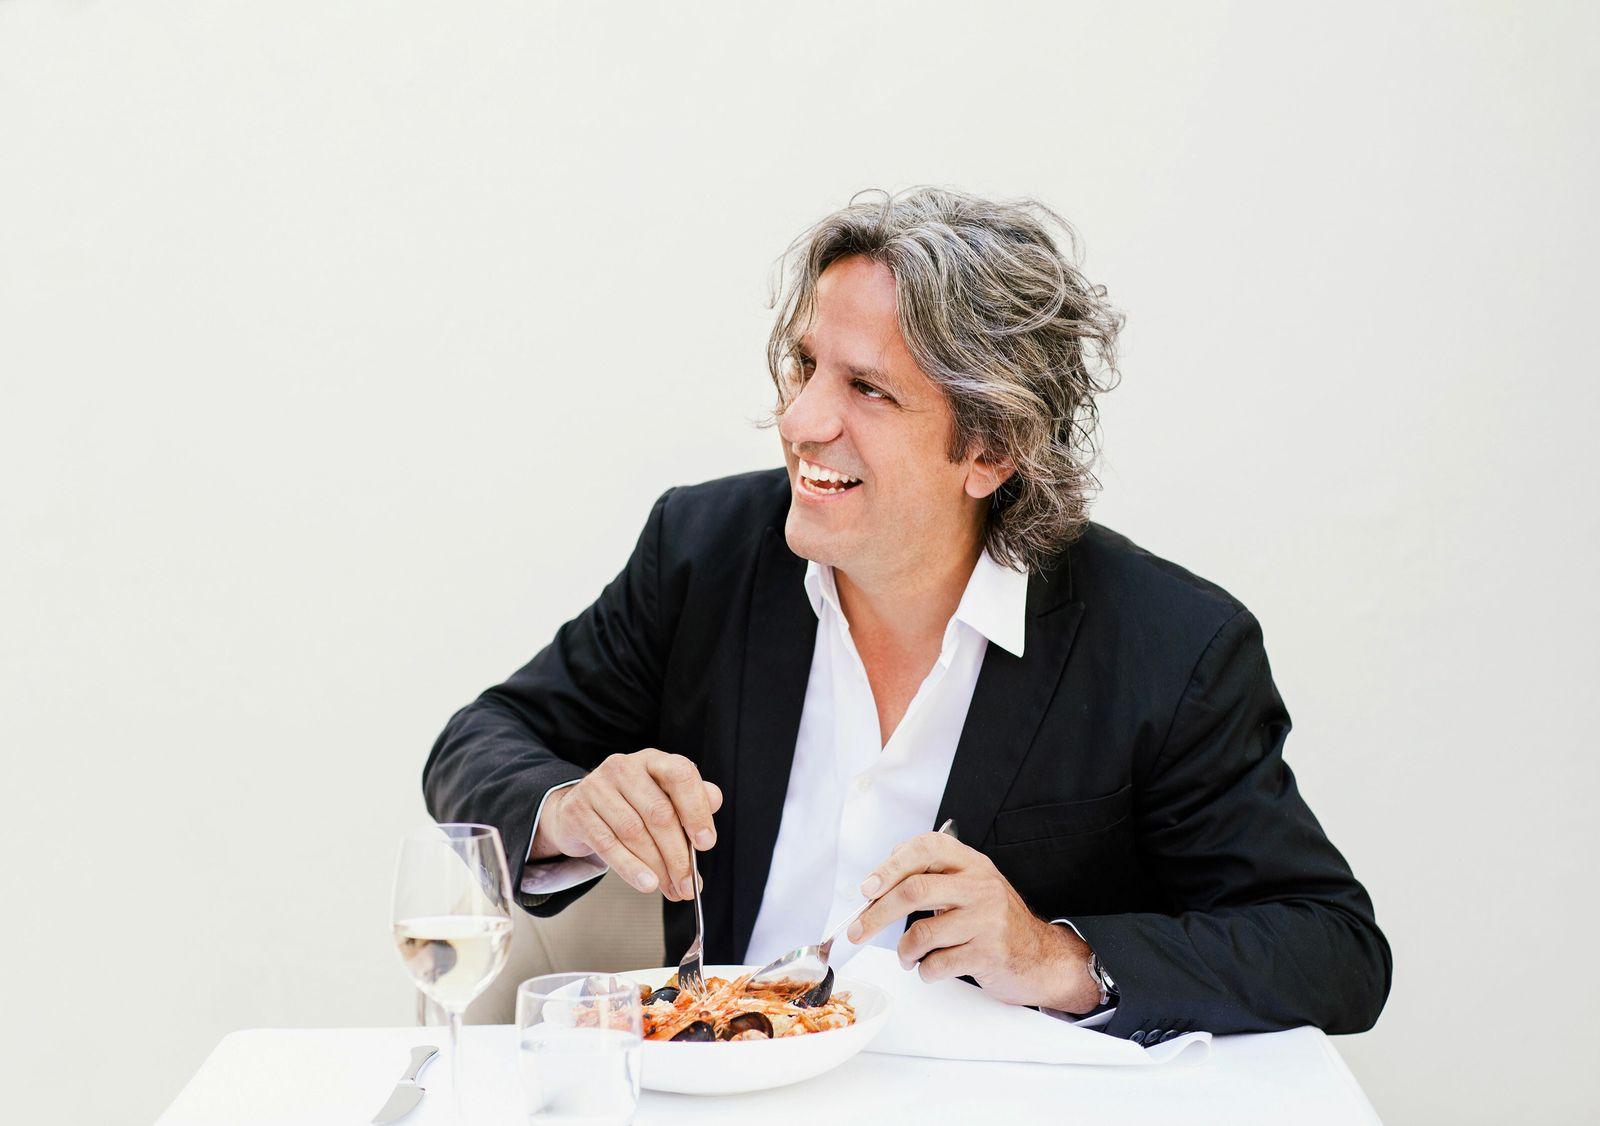 Giorgio Locatelli is owner of Locanda Locatelli in London.